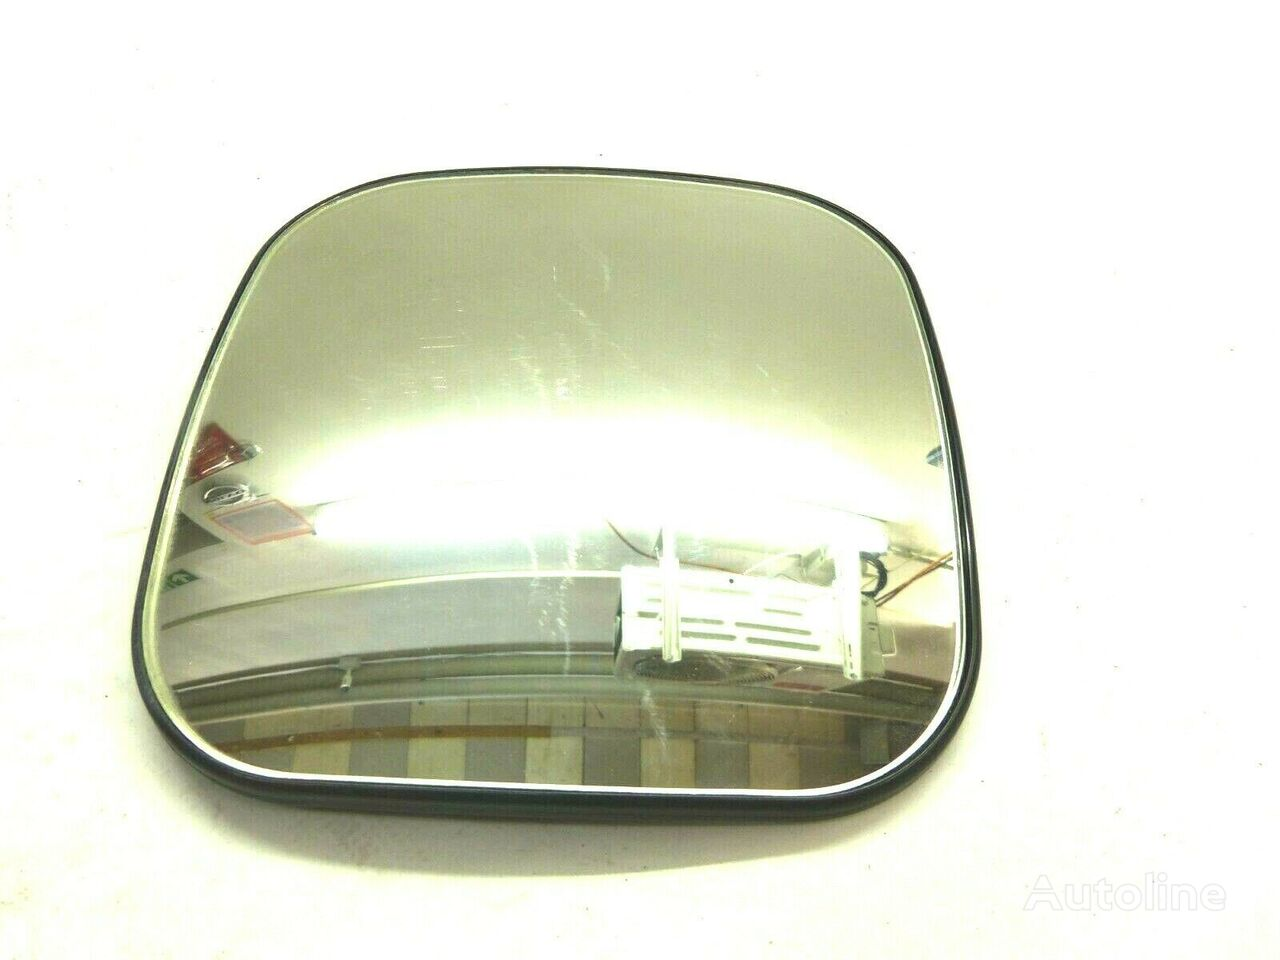 MEKRA Original Spiegelglas 24V 15.3712.870H (153712870H) espejo retrovisor para VOLVO camión nuevo